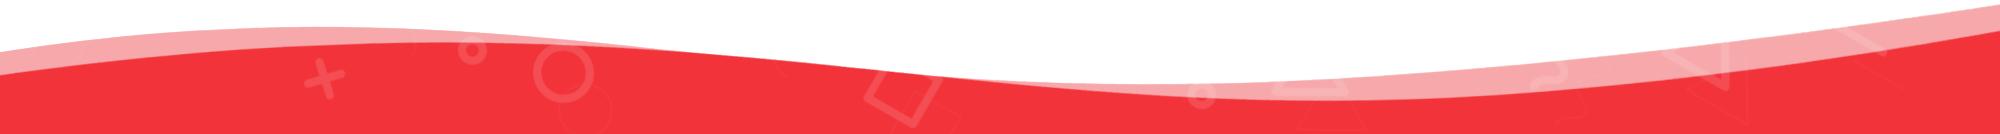 Red Seperator Line - Web Development Company - eCommerce Web Designer - Web Design Firm